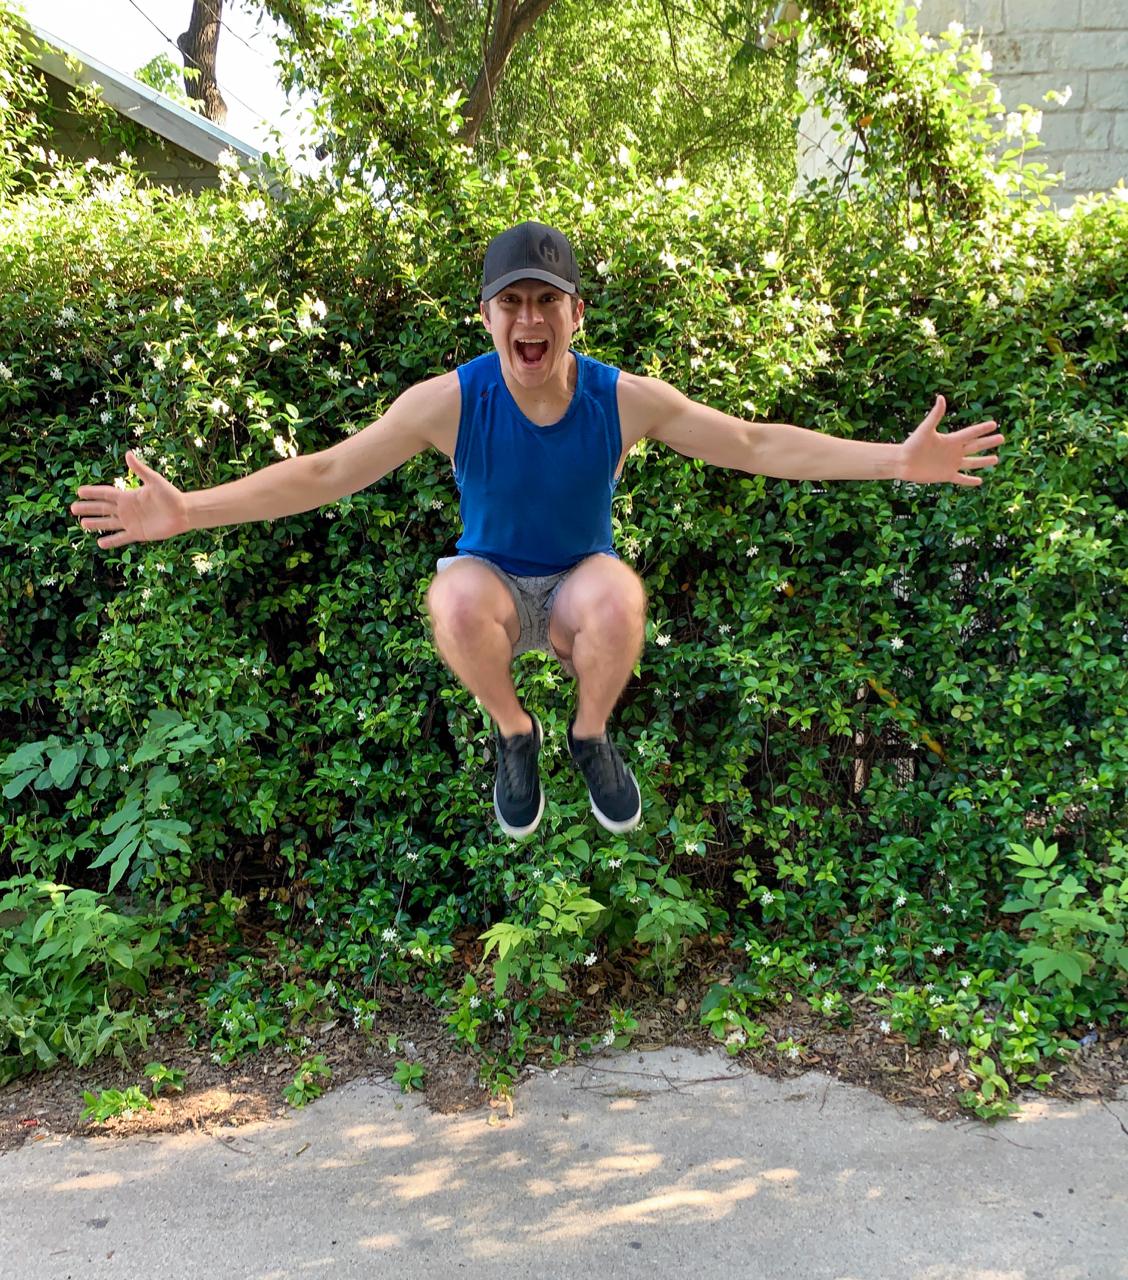 tuck_jump.jpg